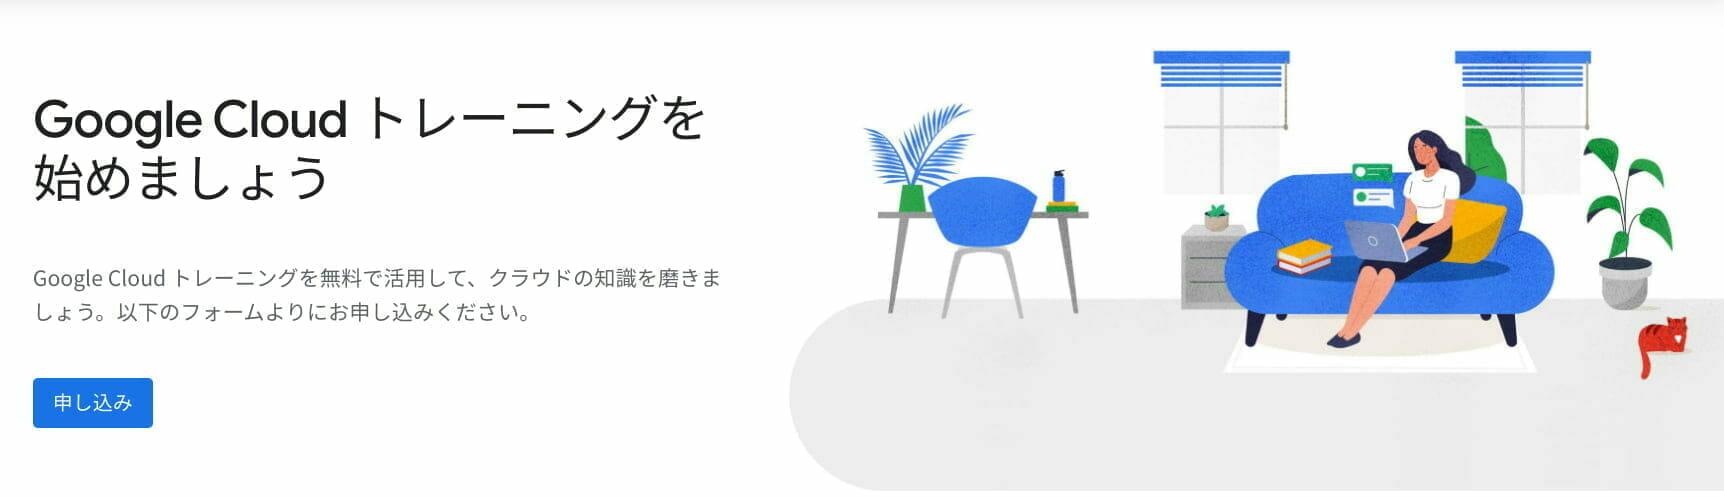 Google Cloud トレーニングを無料で活用